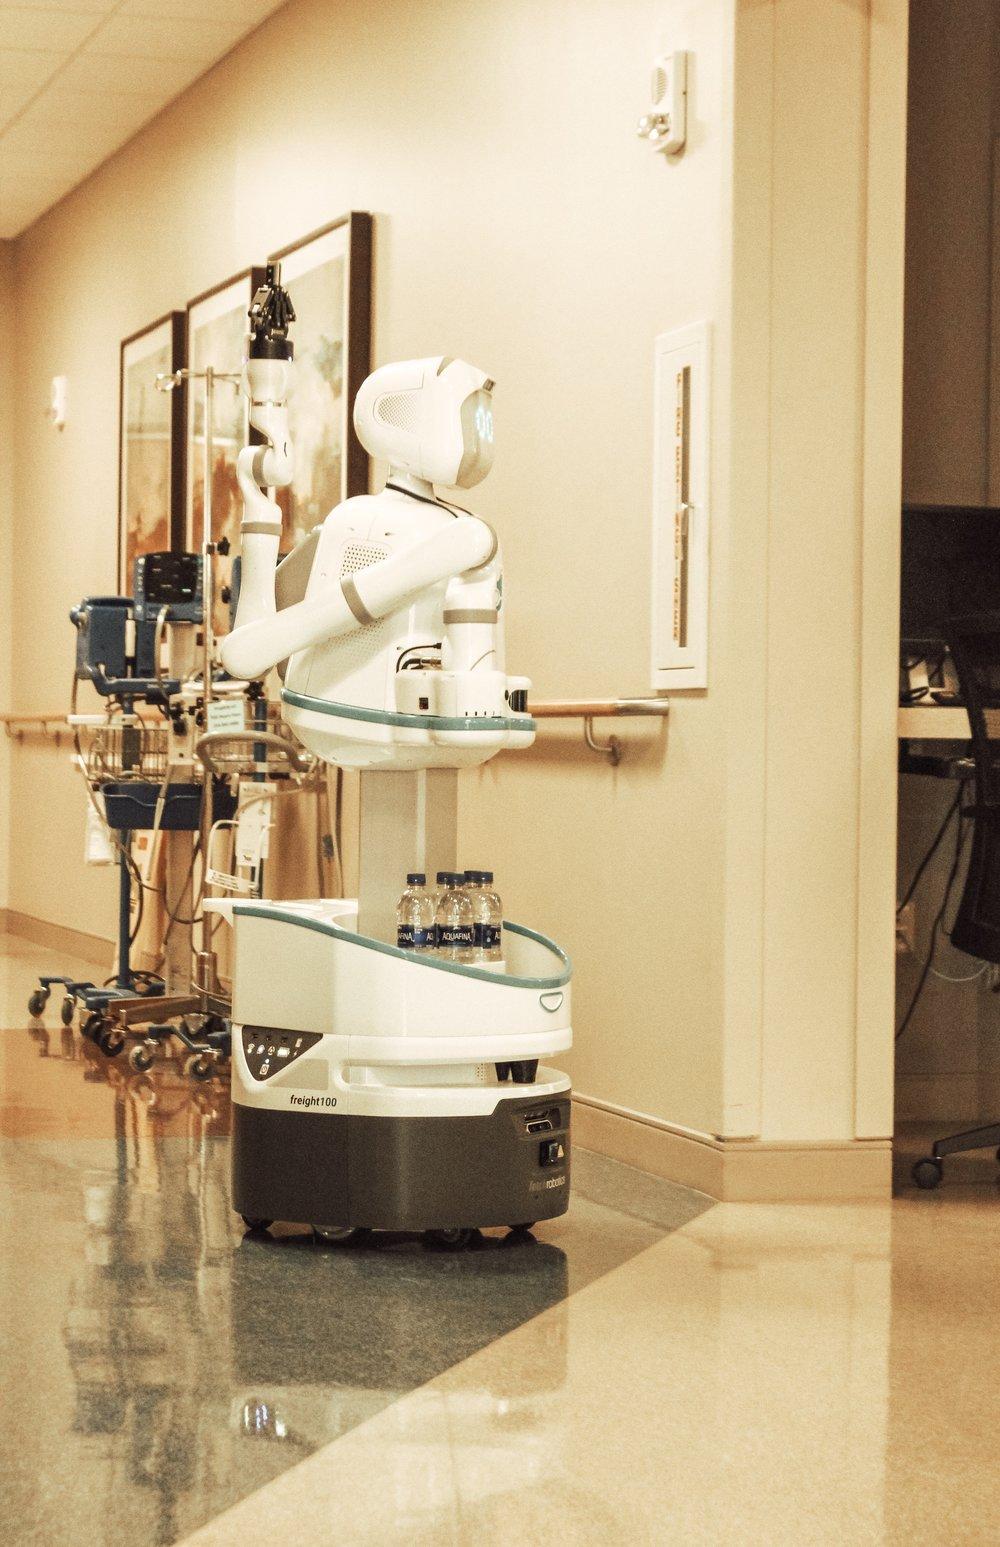 Moxi at Texas Health Dallas.jpg